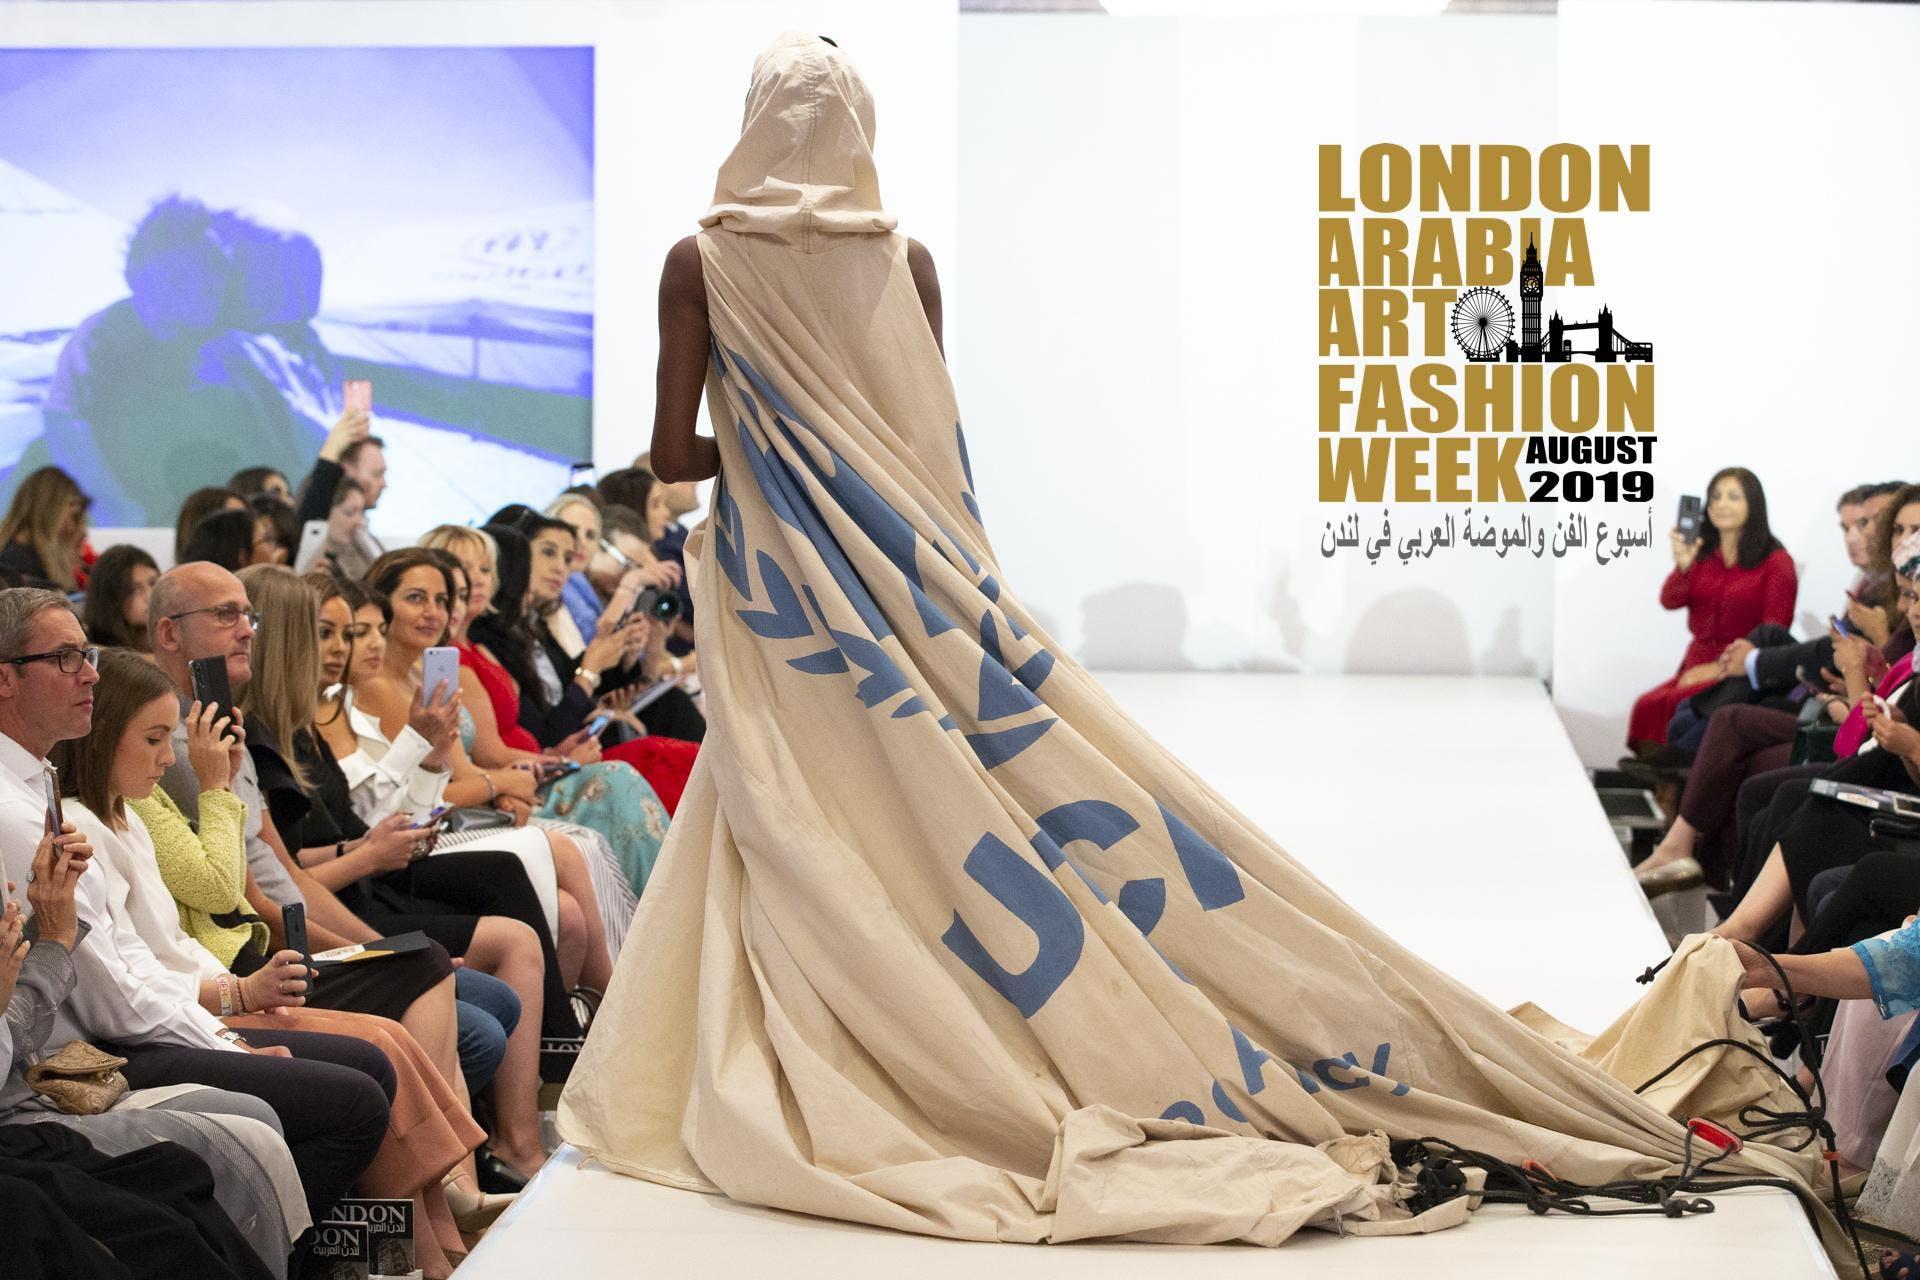 London Arabia Art & Fashion Week 2019